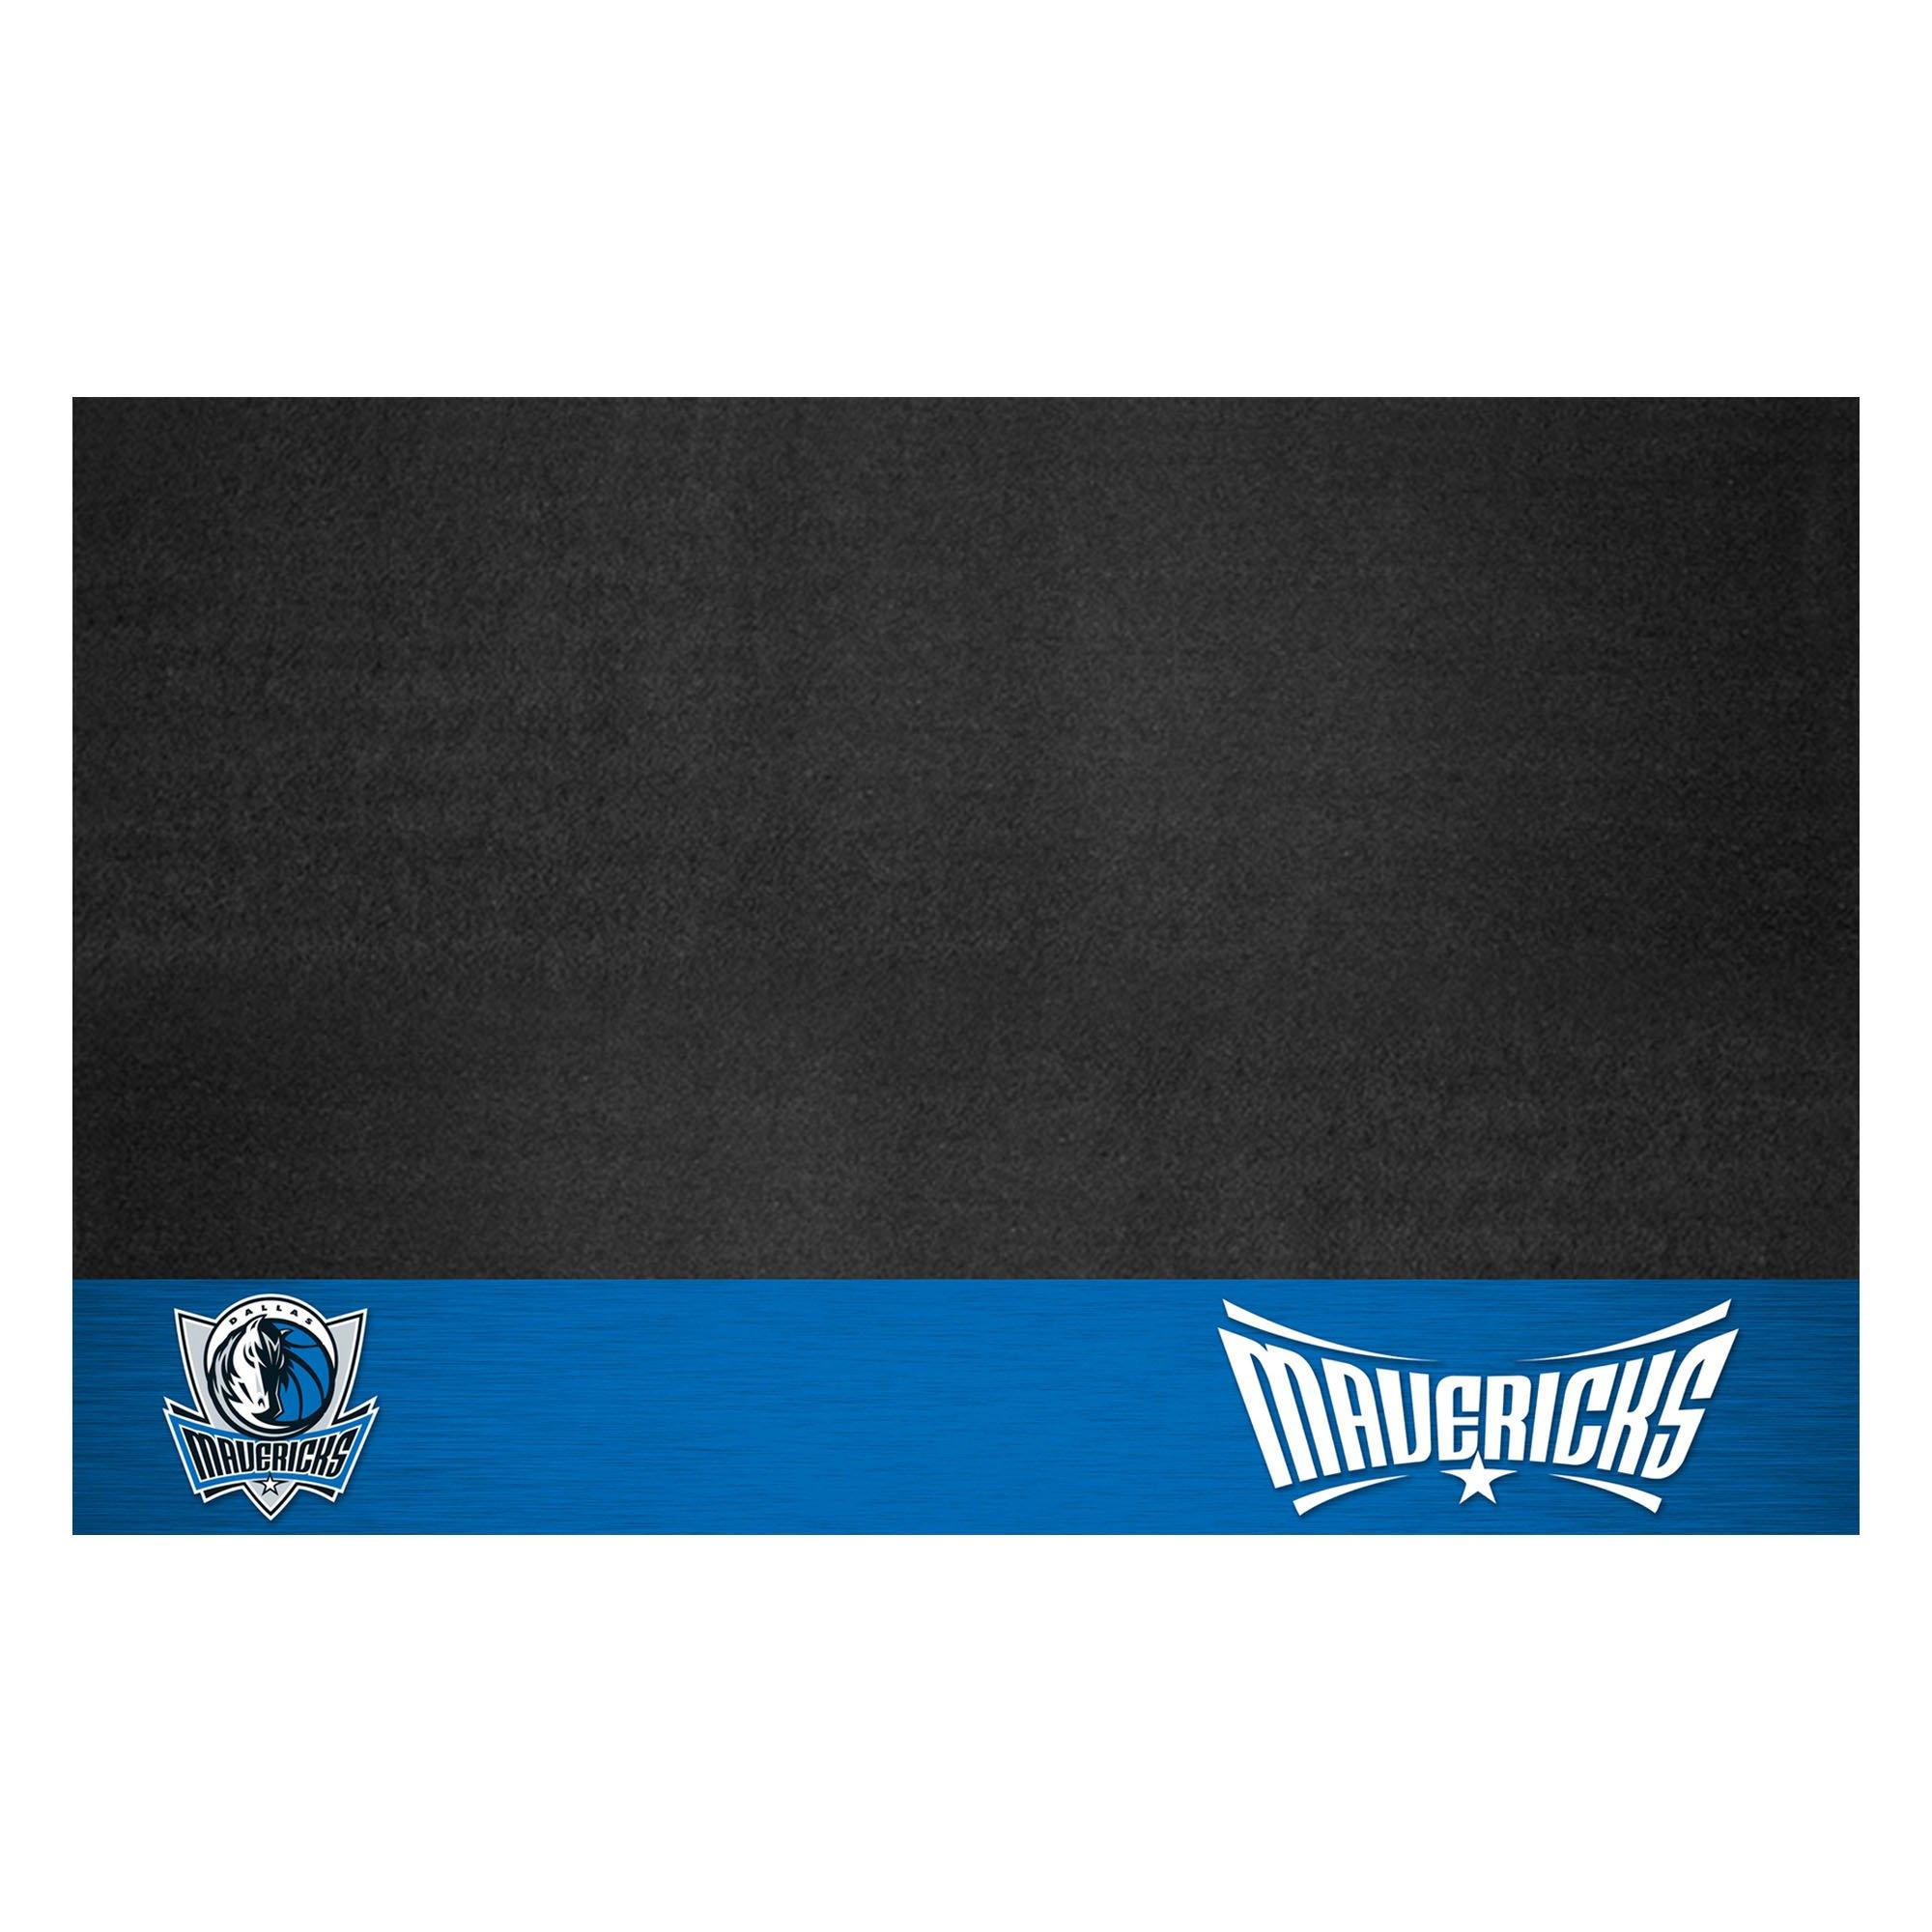 FANMATS 14201 NBA Dallas Mavericks Grill Mat